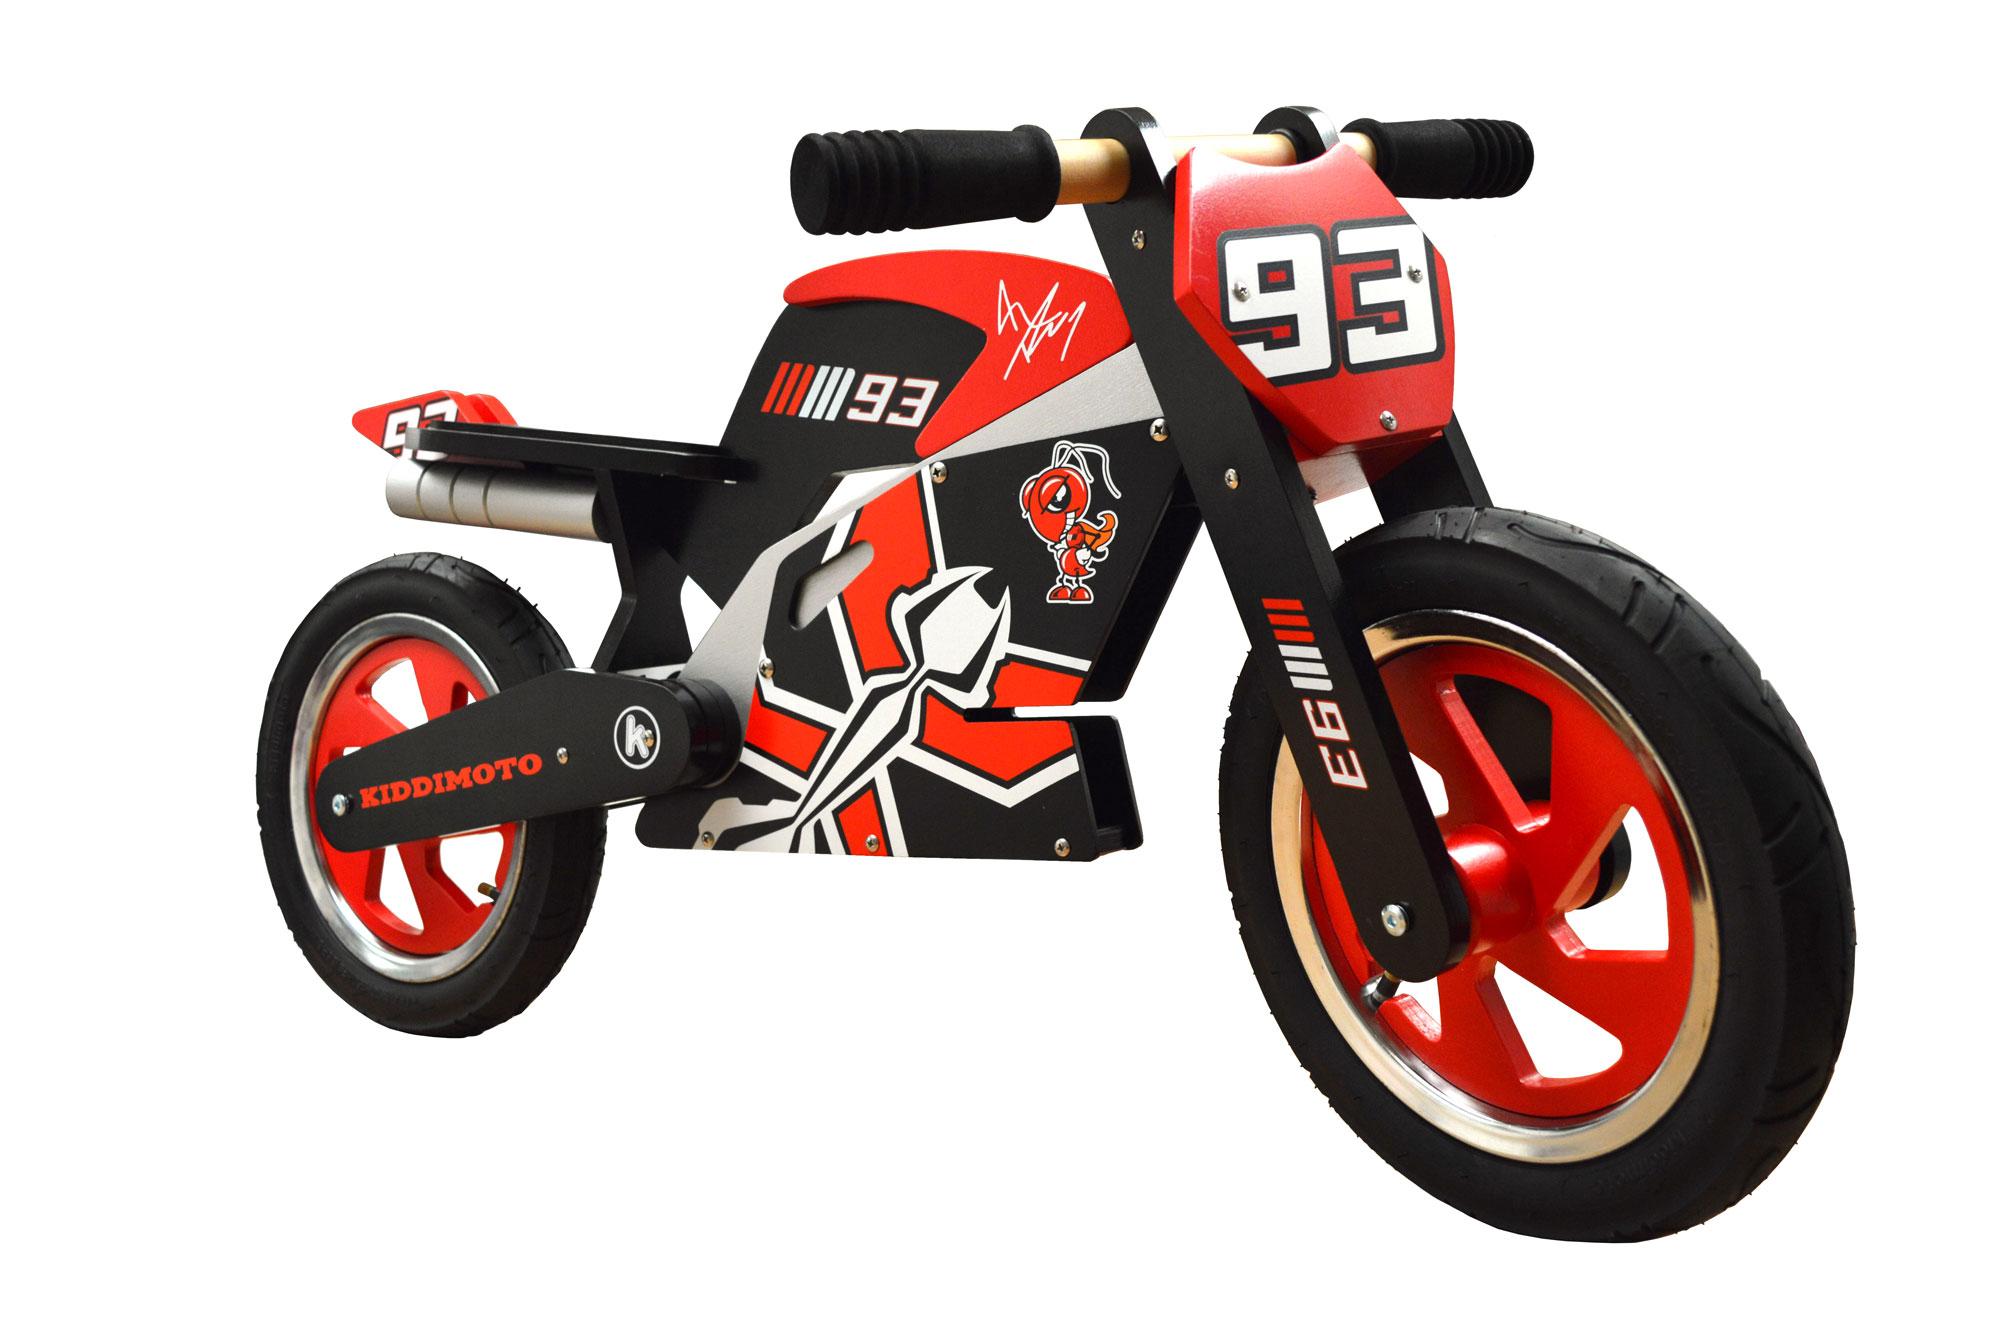 Kiddimoto Marc Marquez Hero Superbike